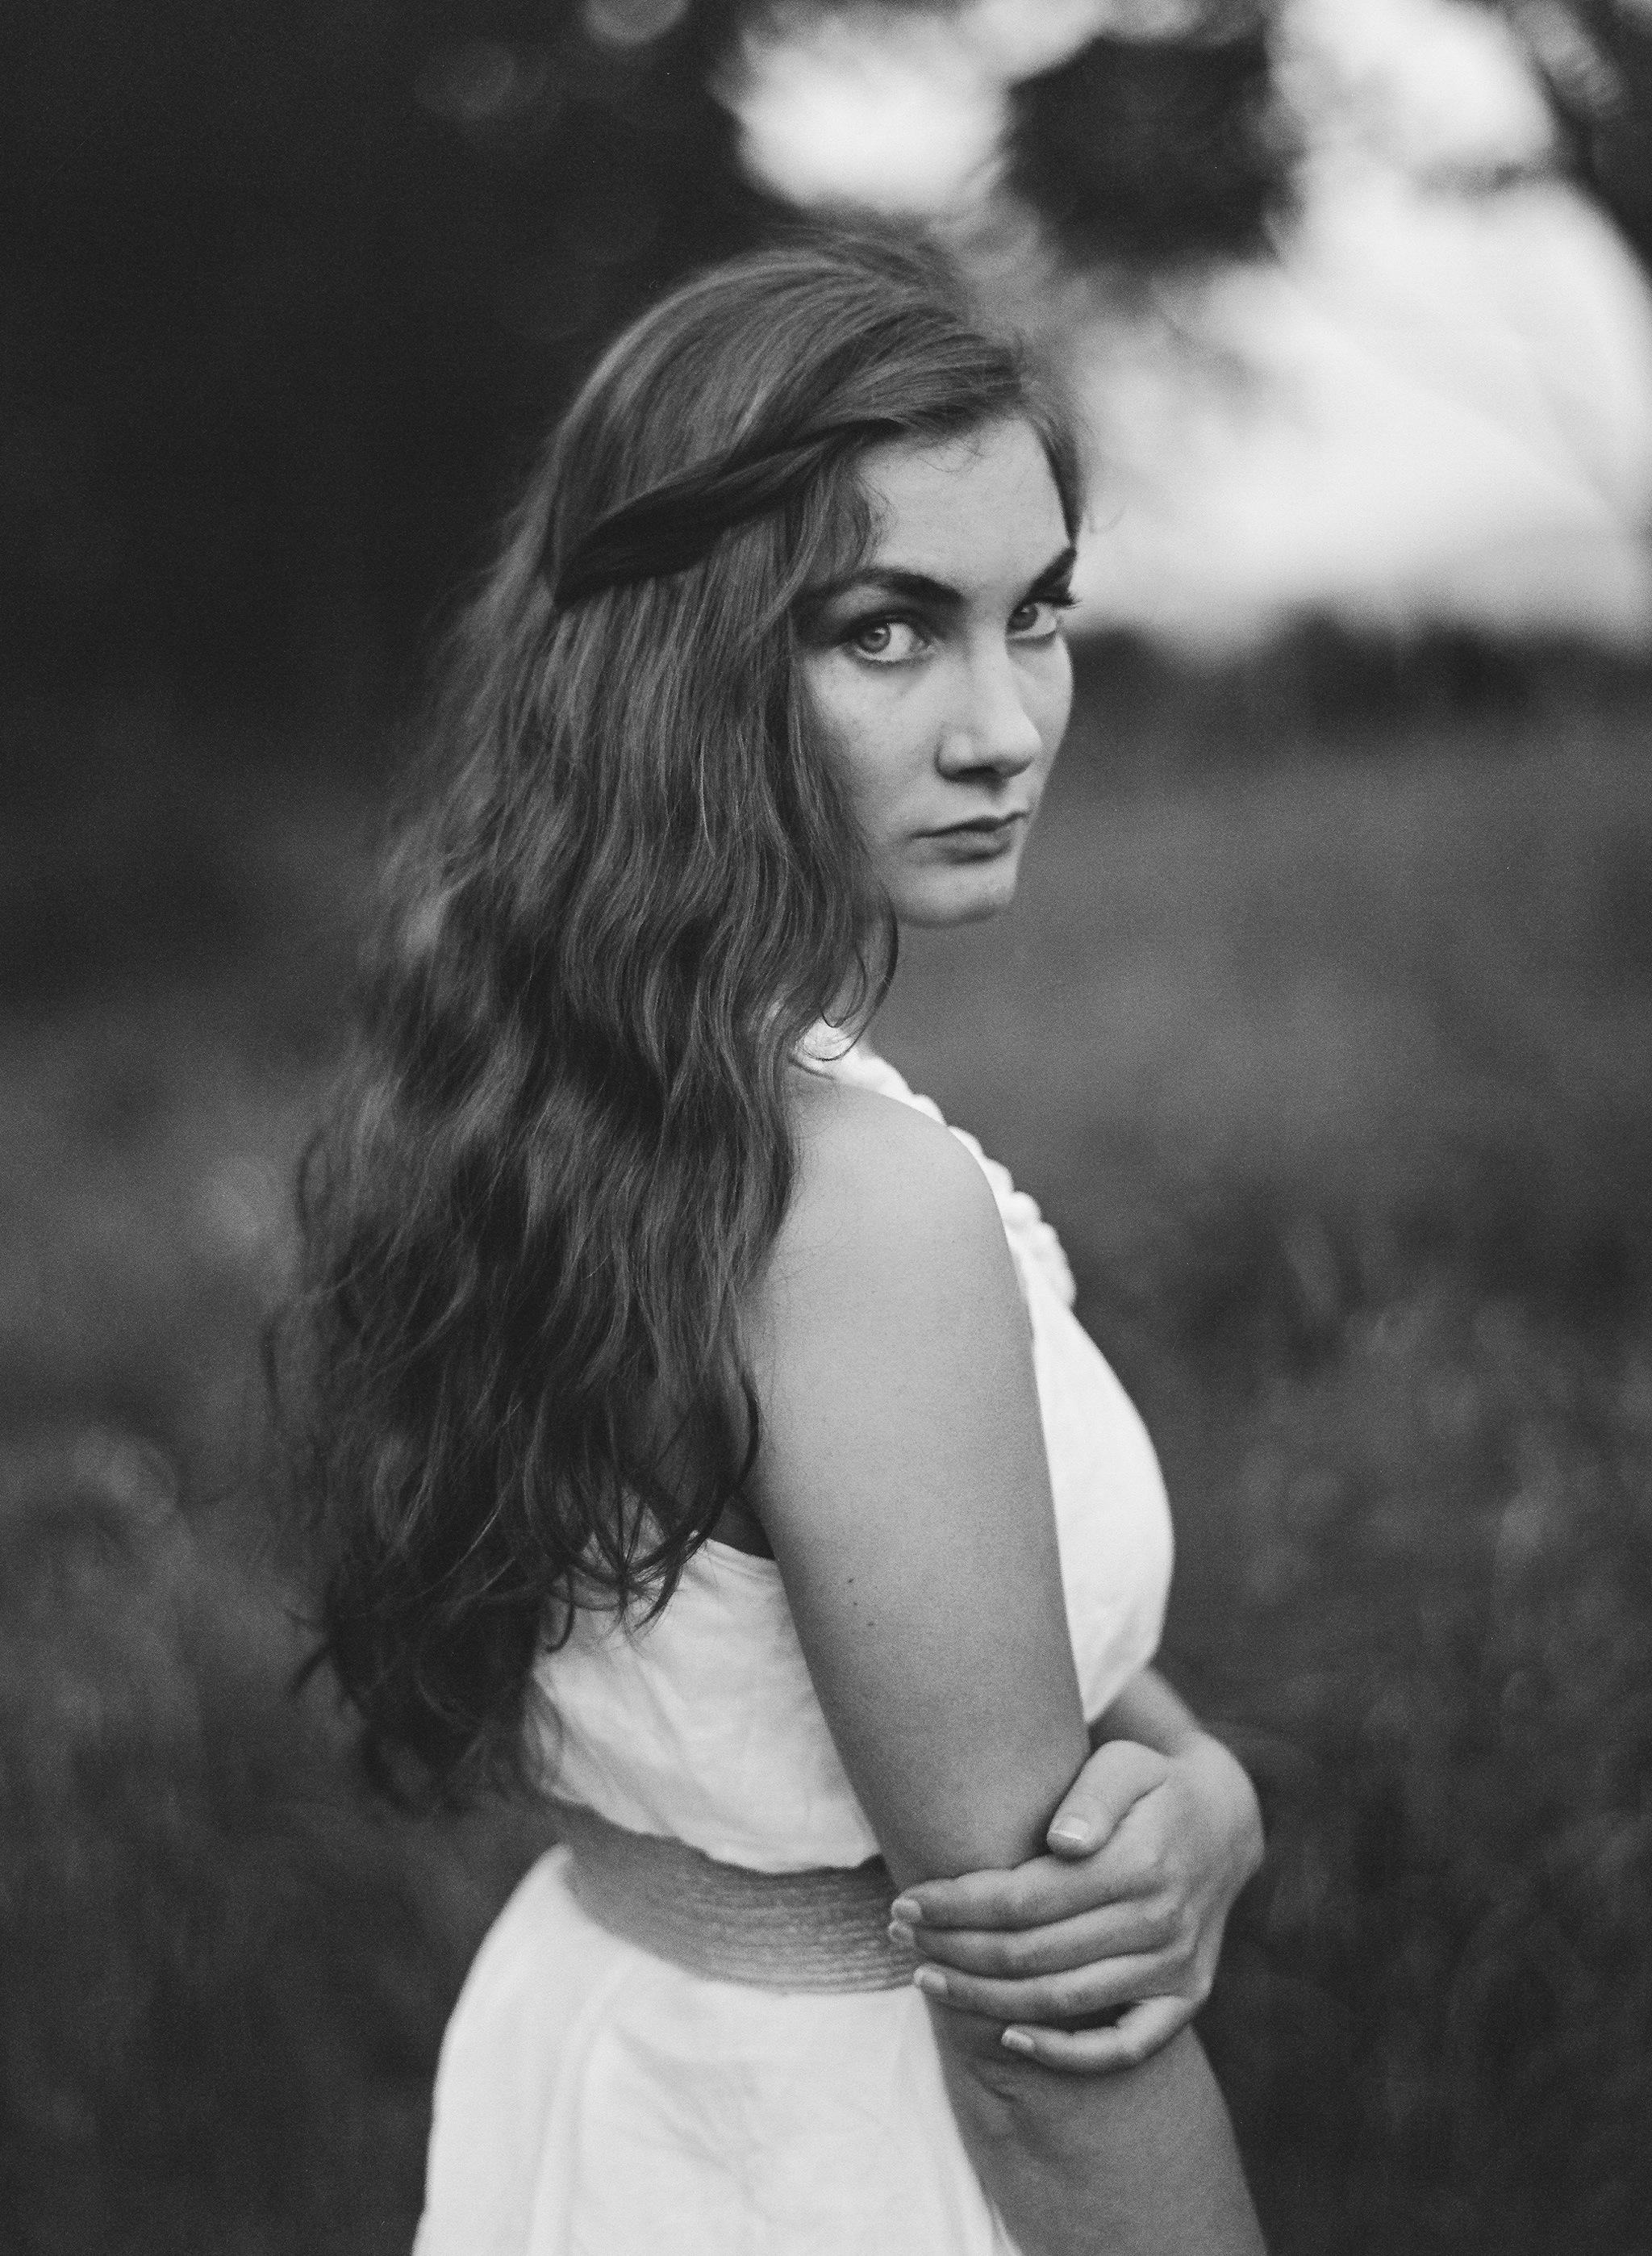 Senior Portrait Photographer Northampton MA